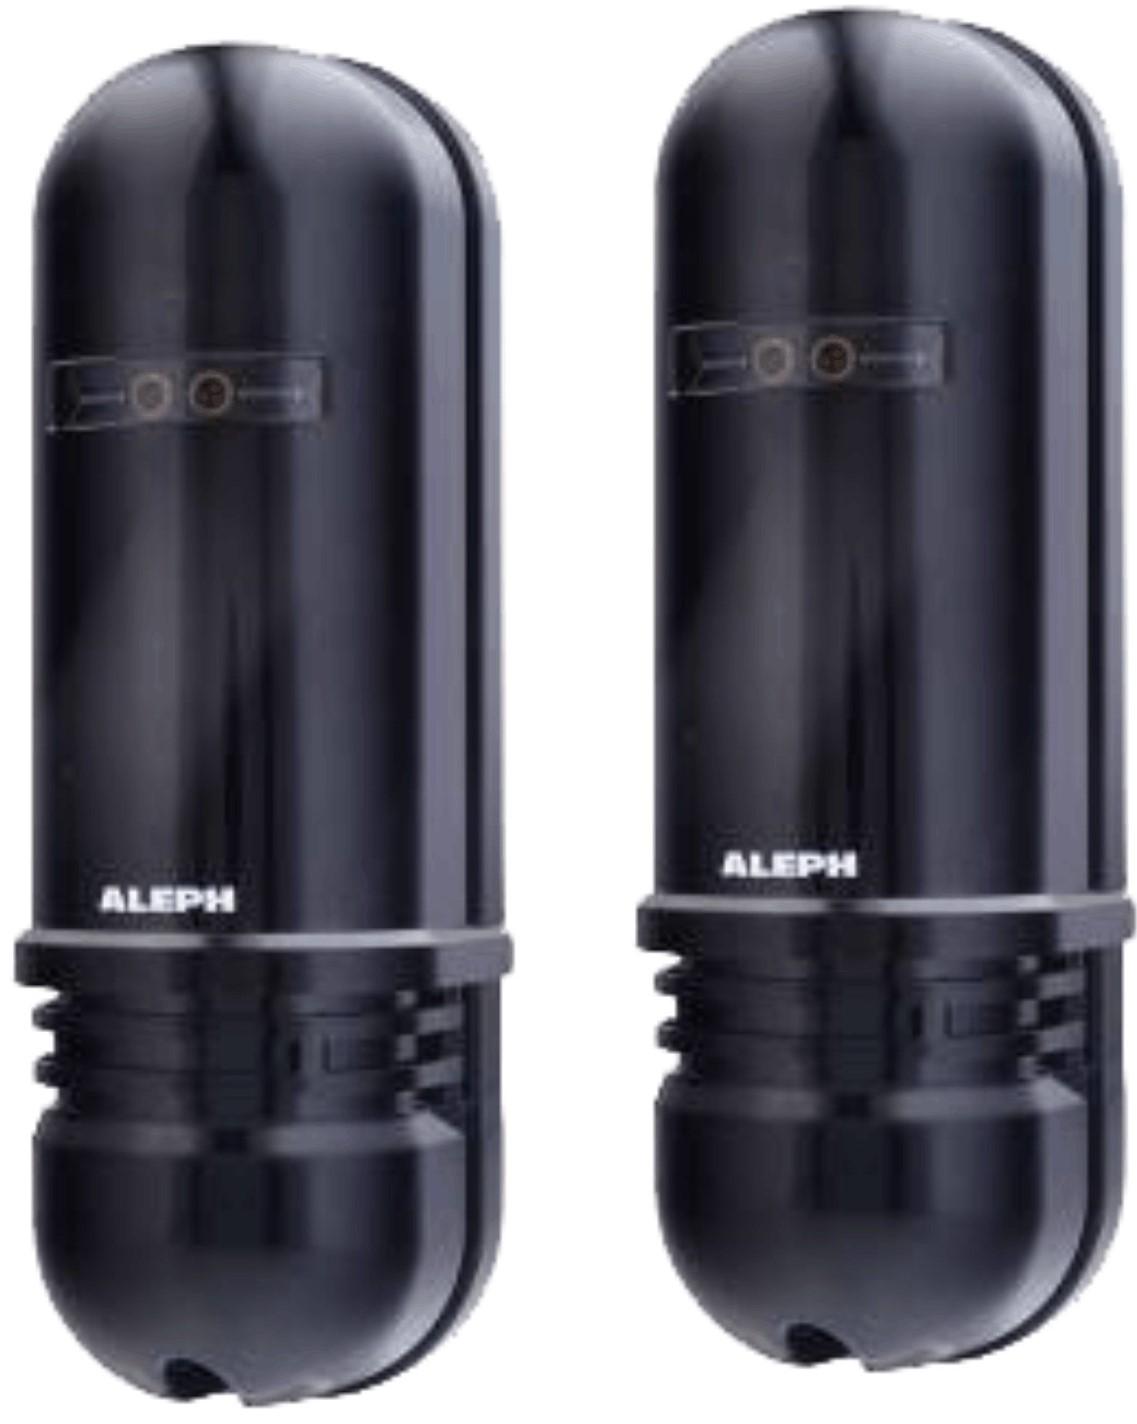 Beams διπλής δέσμης, εσωτερικού & εξωτερικού χώρου 60m ALEPH - XA-061D